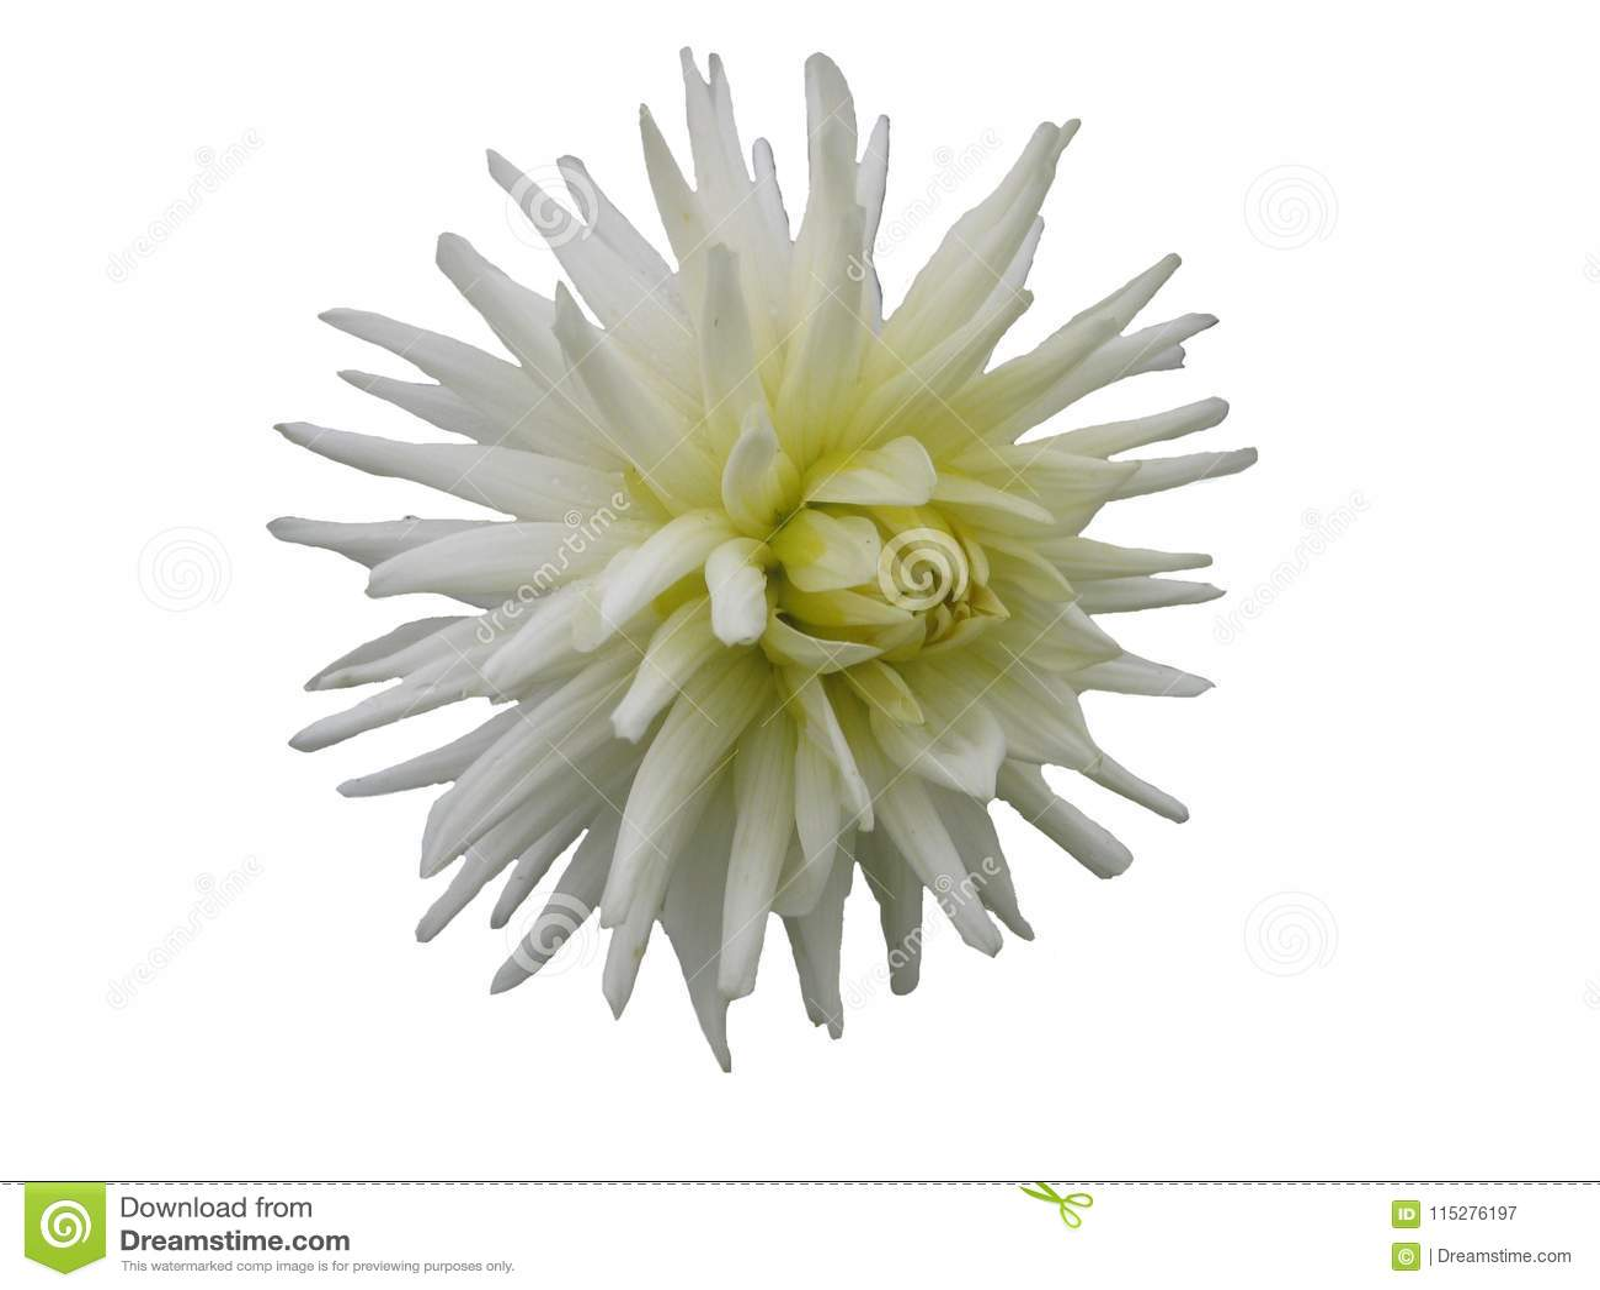 Dahlia Flower With White Needle Like Petals On White Background